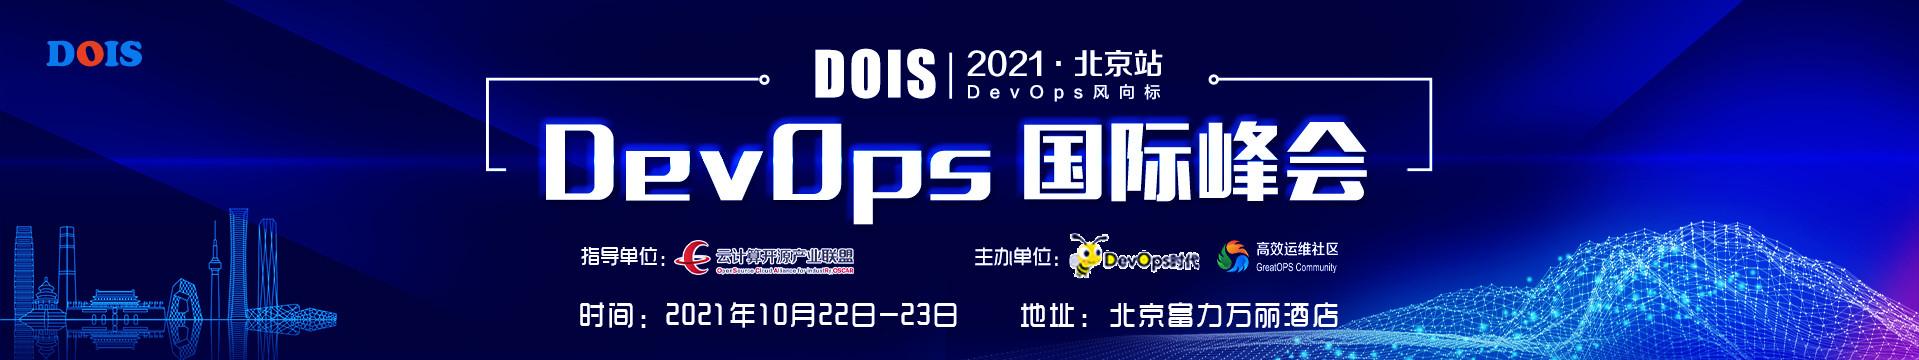 DOIS2021 DevOps国际峰会北京站